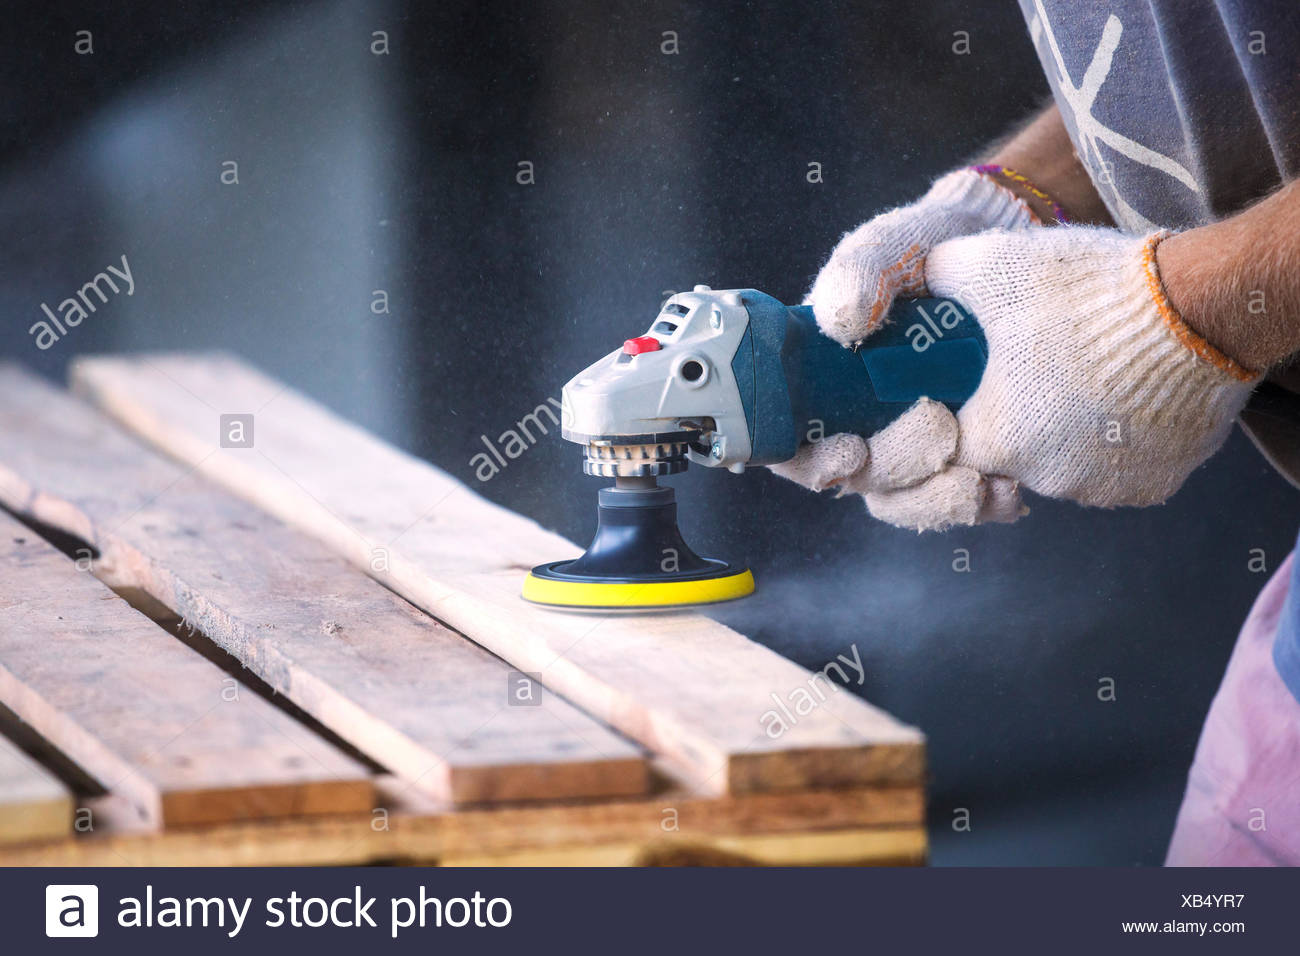 Man sanding wood with a random orbital sander - Stock Image